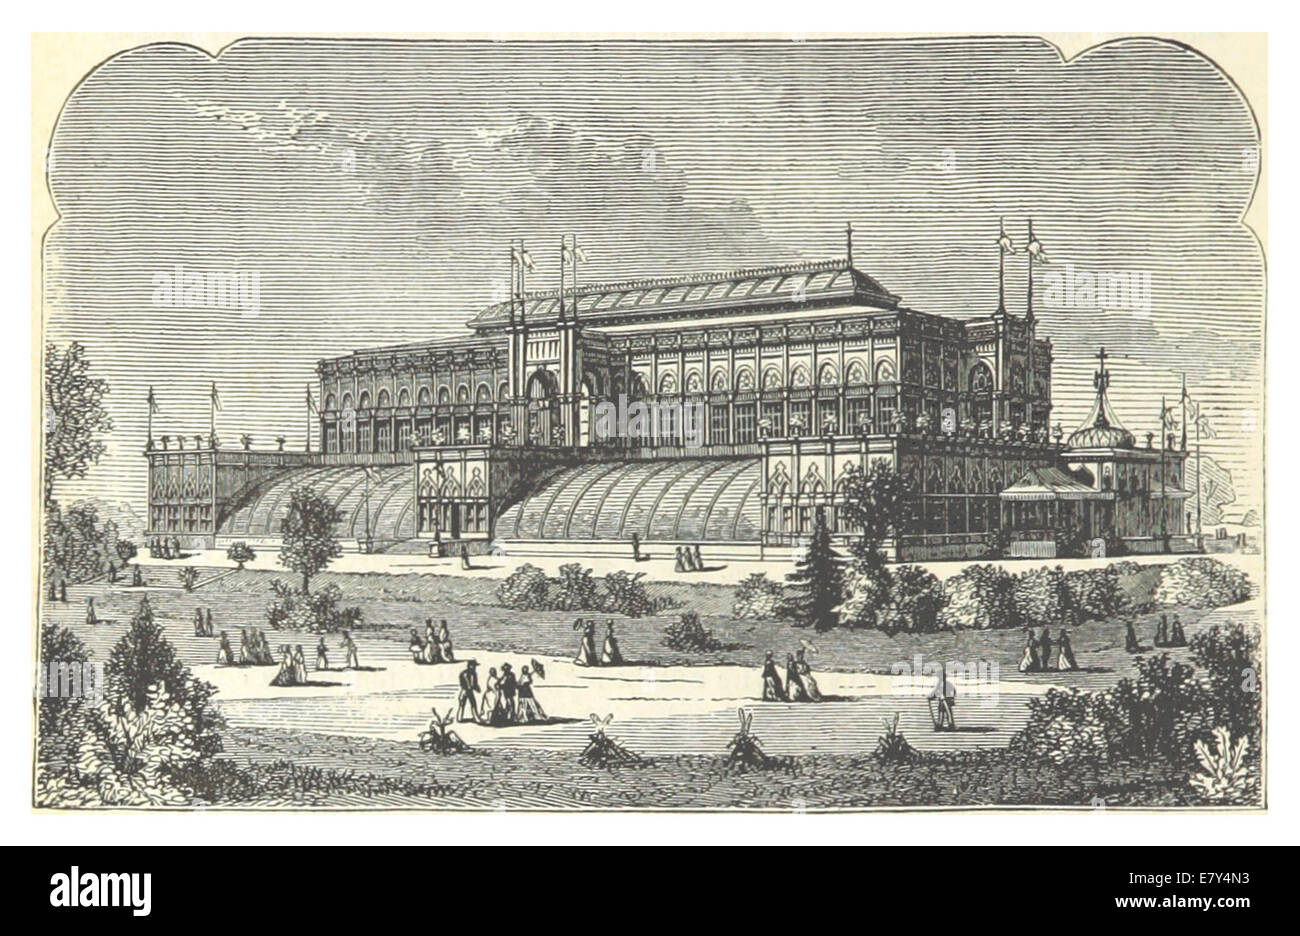 (1876Exhib) p672 Philadelphia 1876 - HORTICULTURAL BUILDING - Stock Image